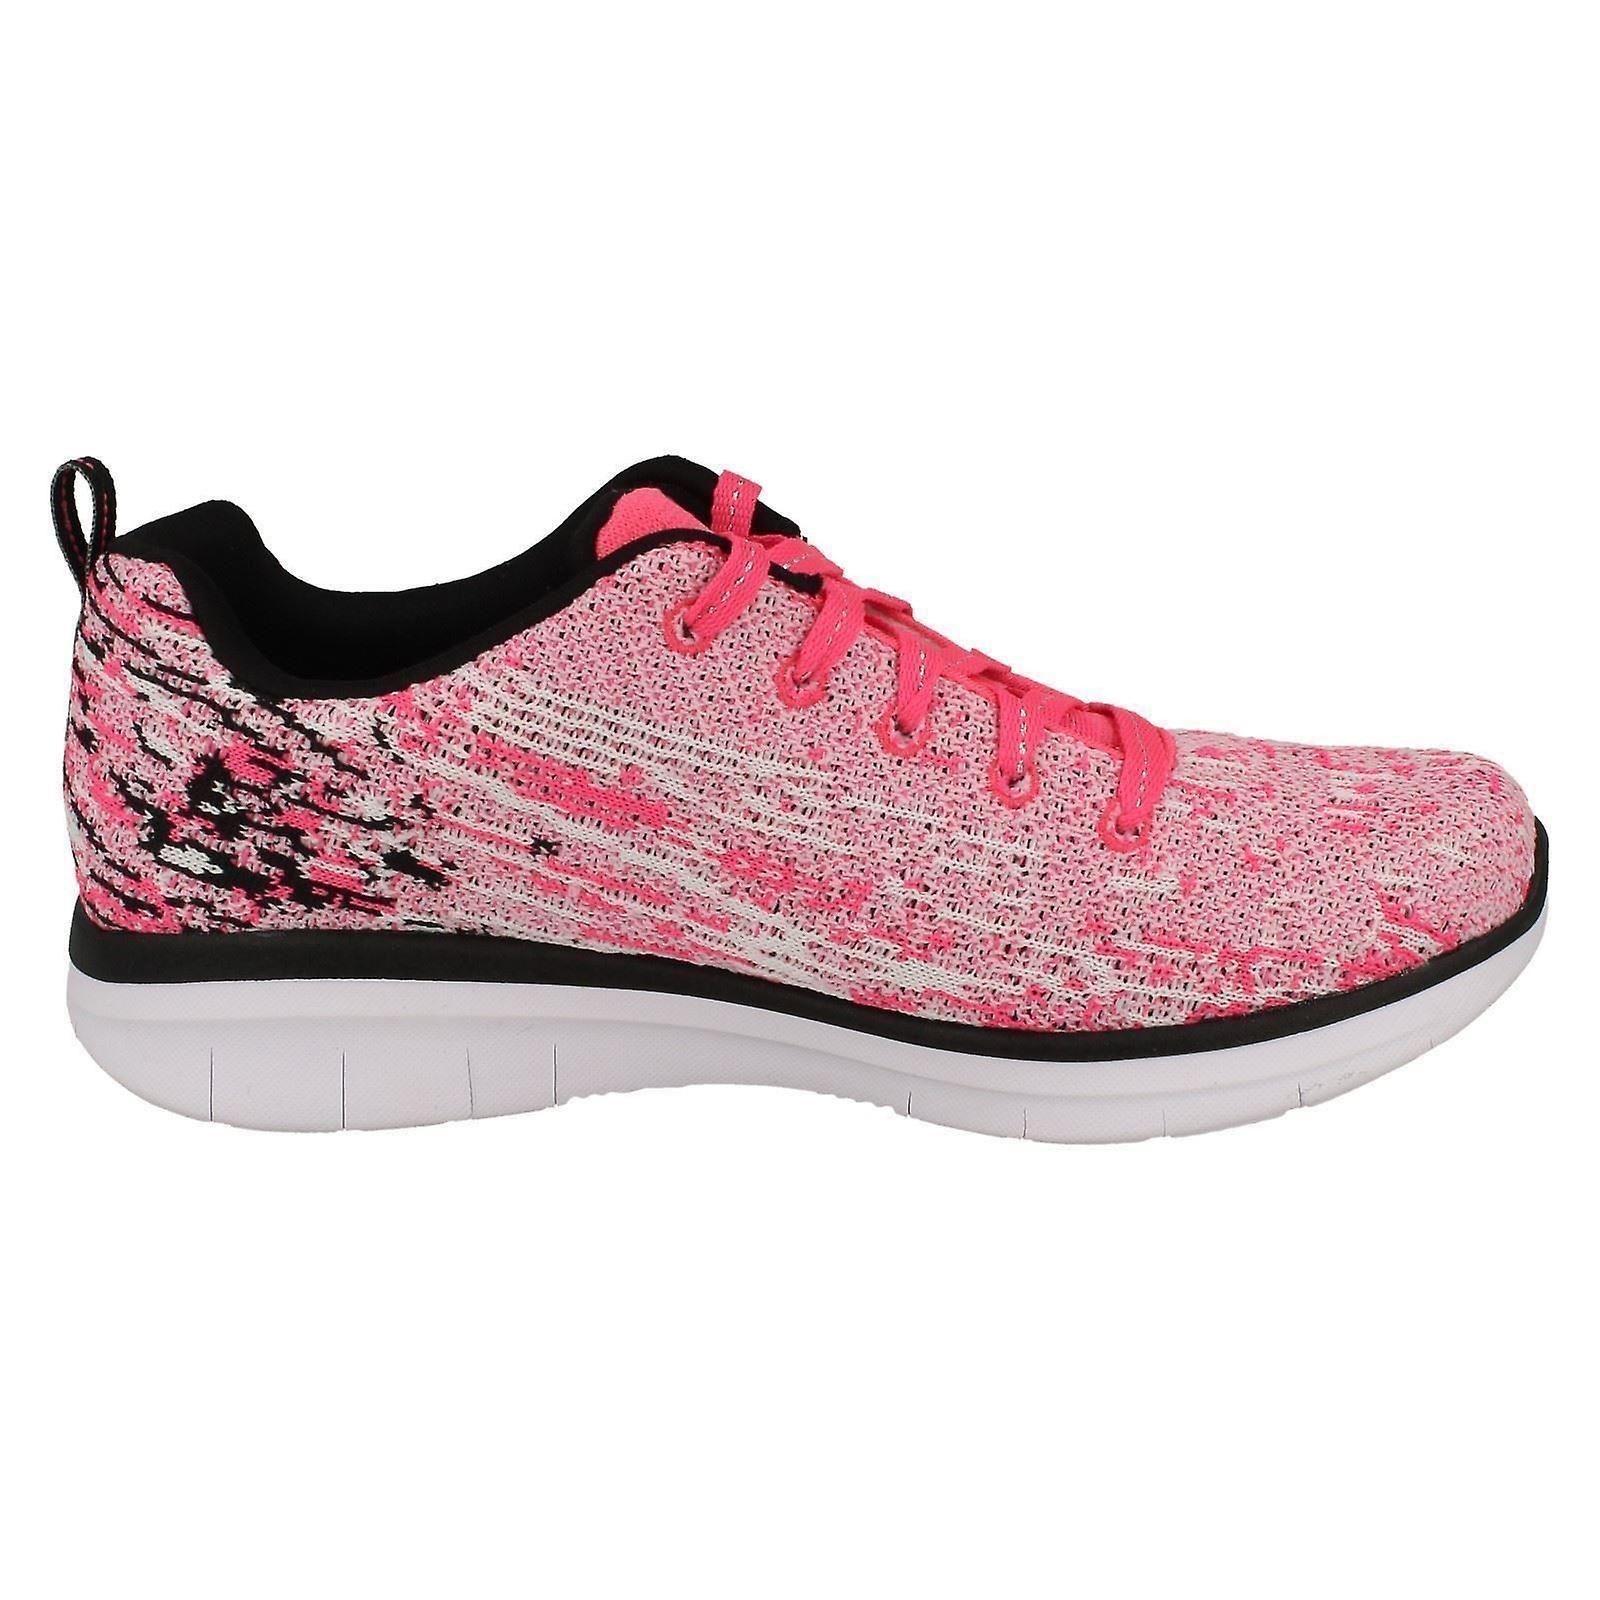 Spirits Pinkblack Trainers 9 High Sports 5 10 81620 27 Us 5 Uk Size Skechers Neon Girls Textile Eu rdCshtQ